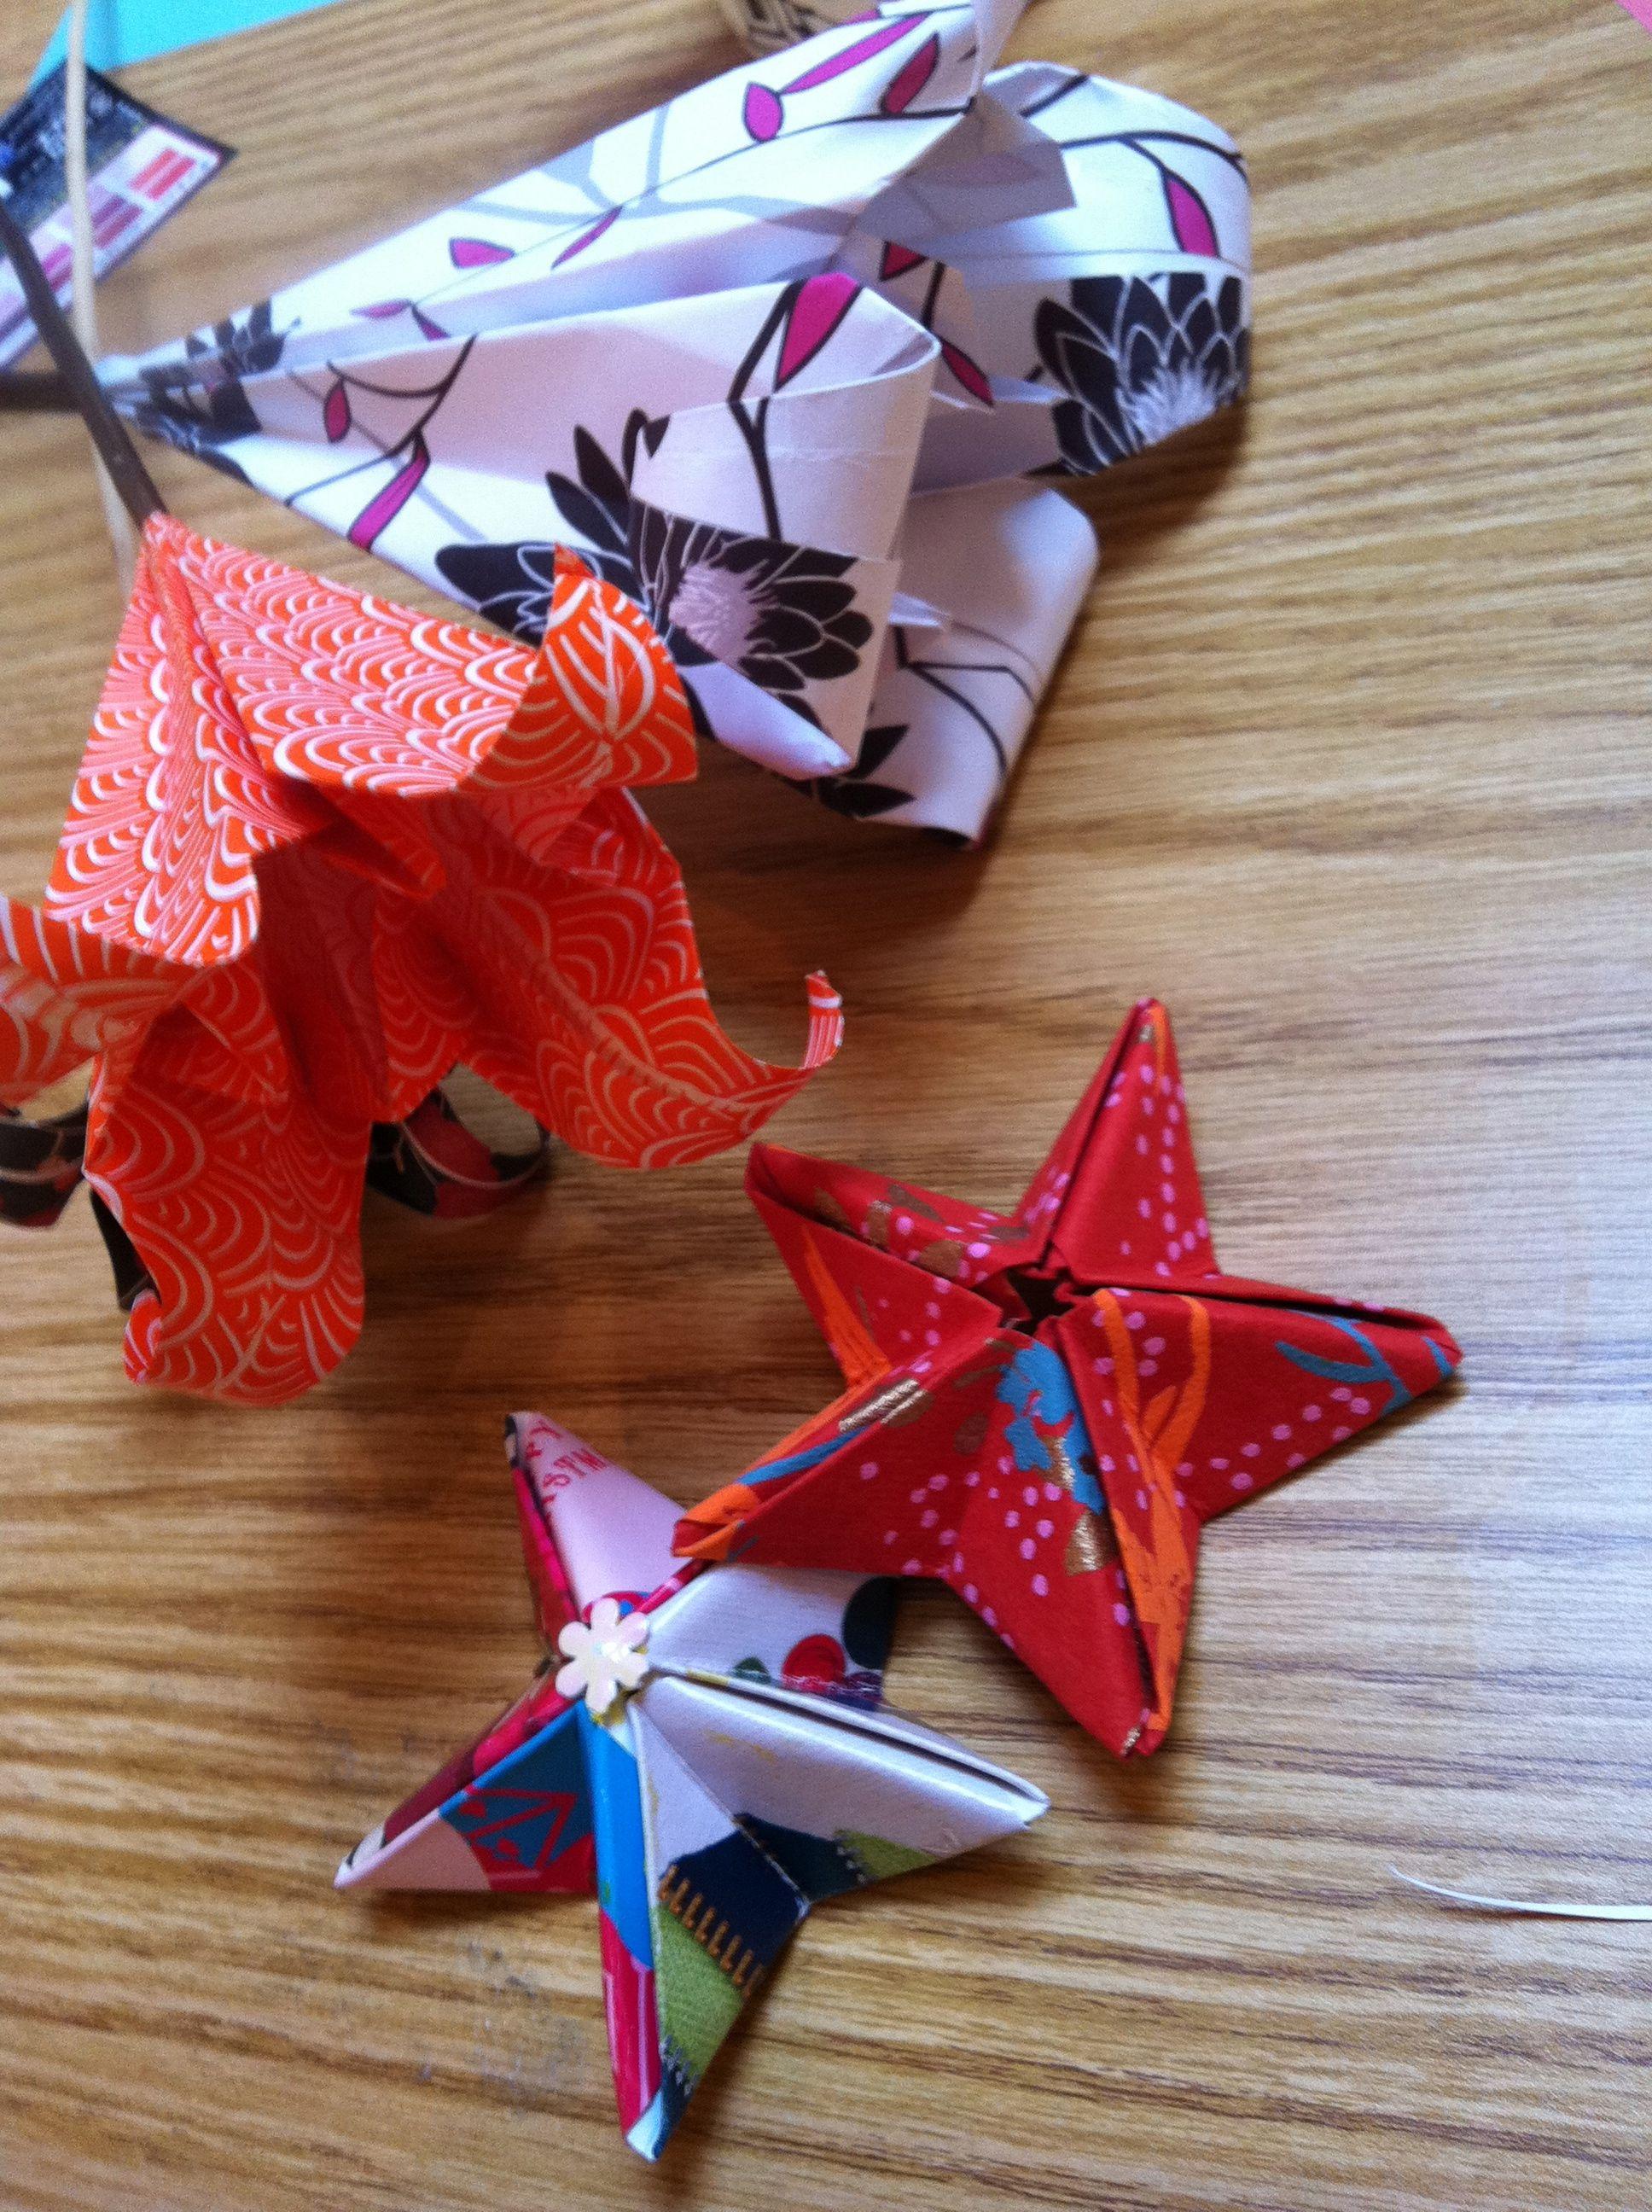 Origami workshop - www.inc-inc.co.uk/workshops